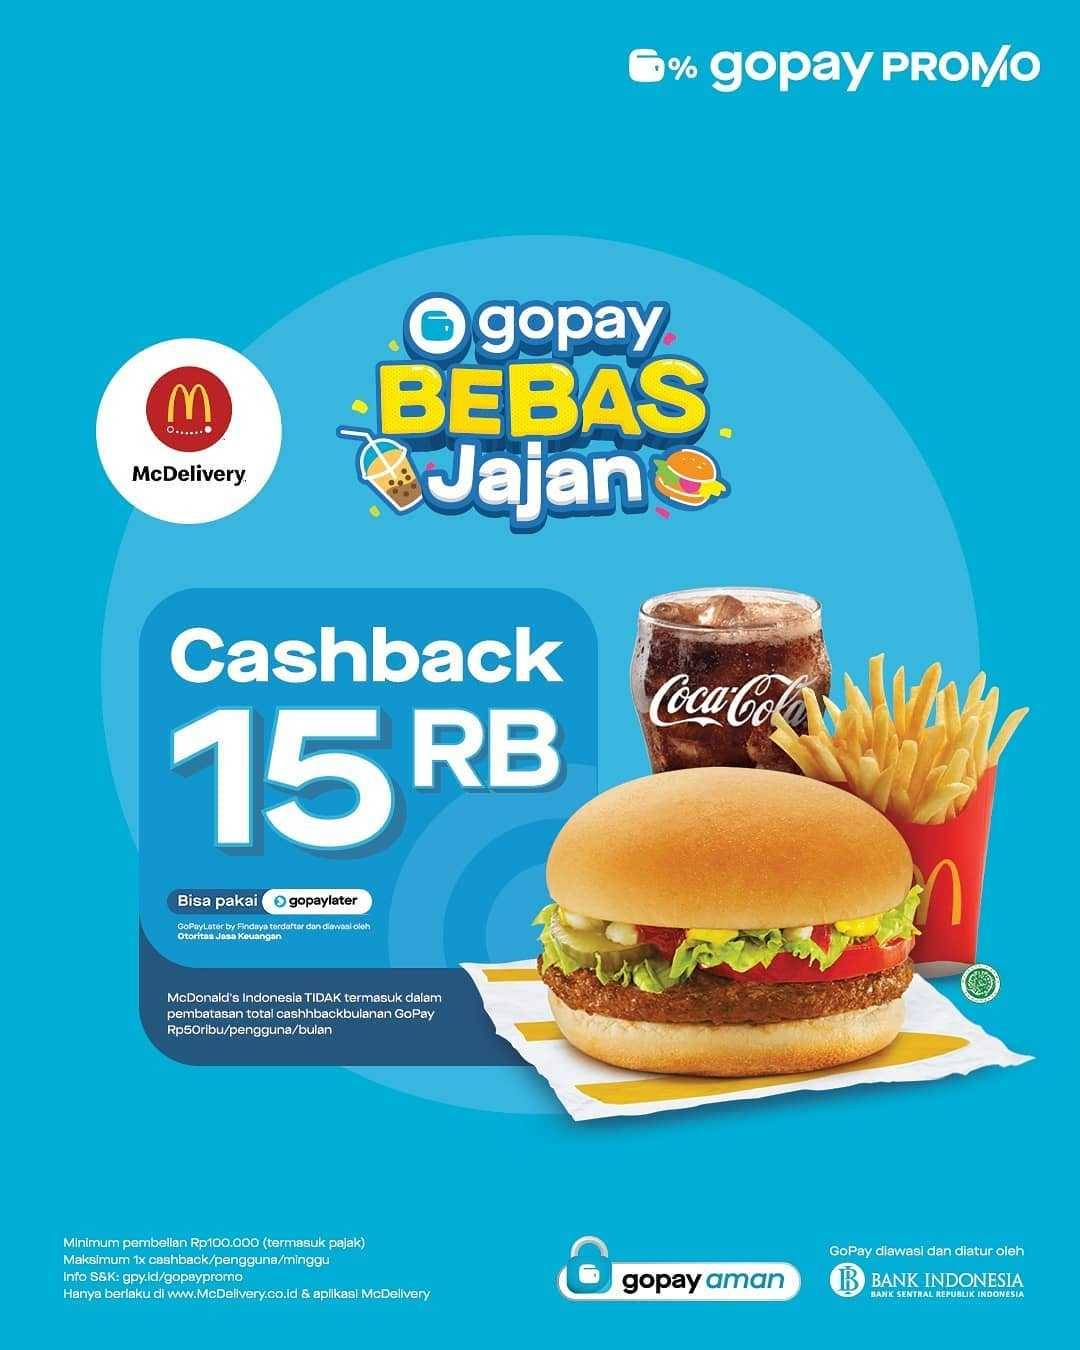 Promo diskon McDonalds Cashback Hingga Rp. 30.000 Dengan Gopay